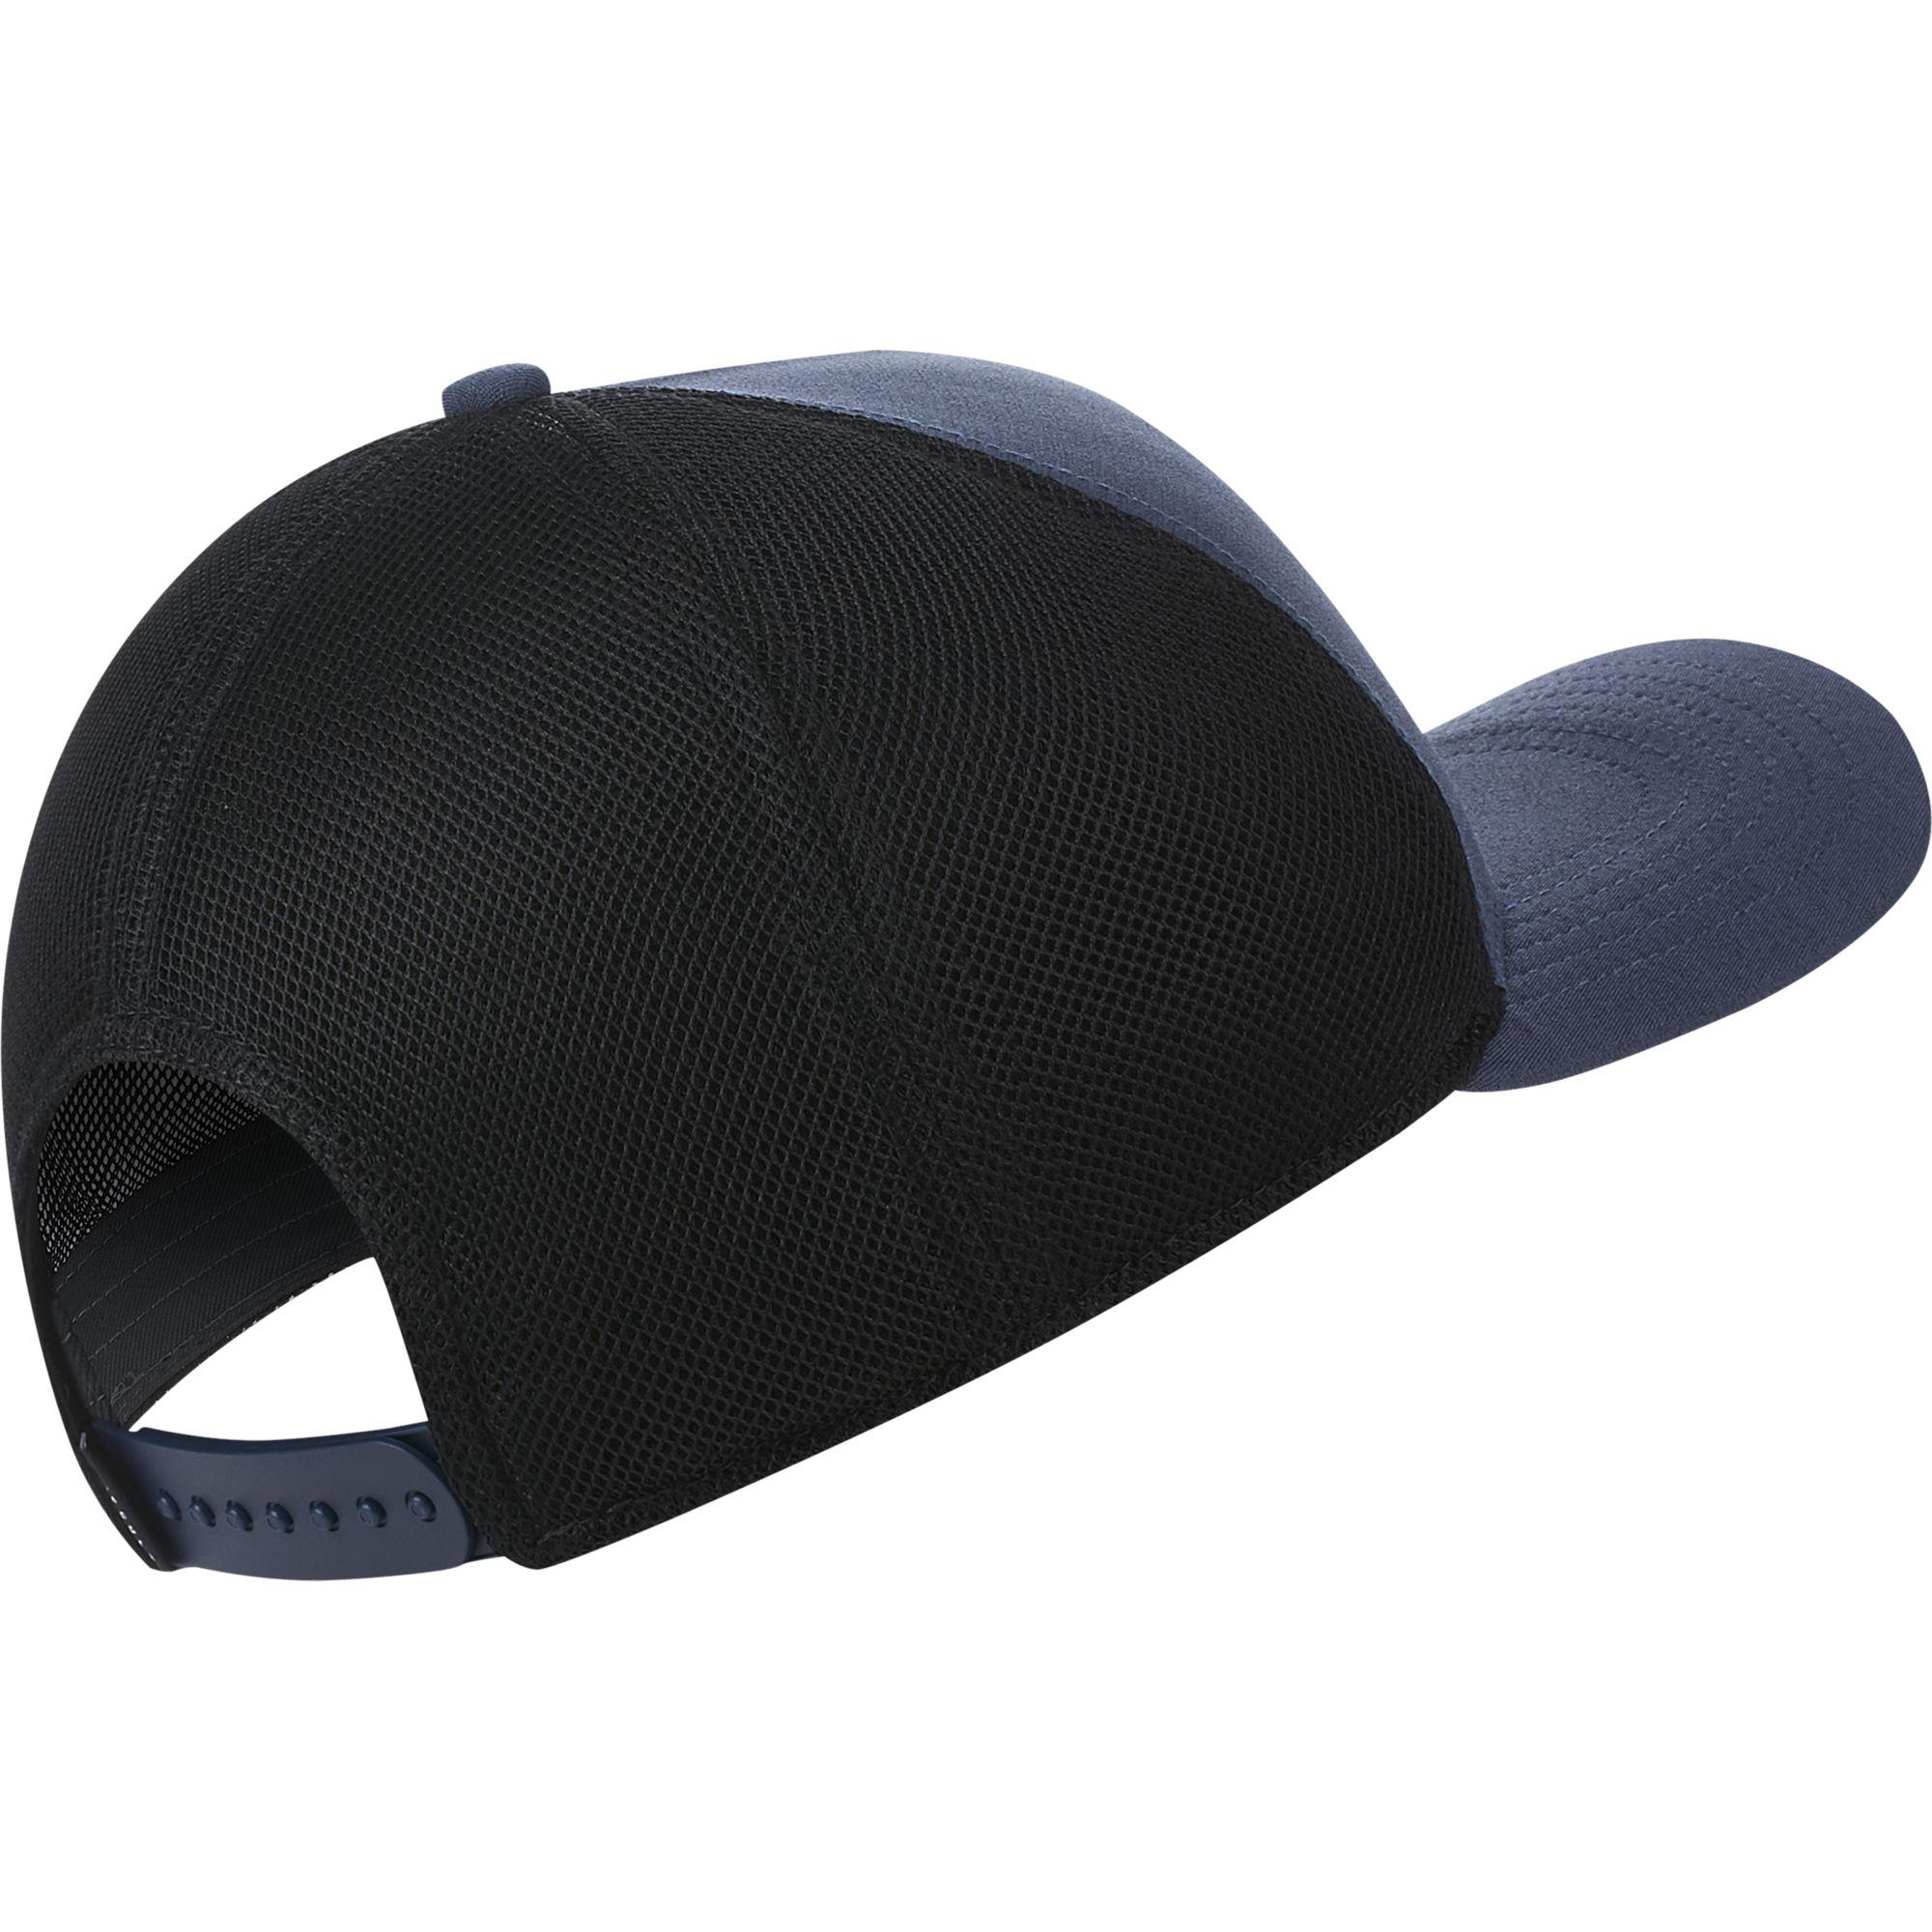 AeroBill Classic99 Mesh Golf Hat, Gray/Black, swatch